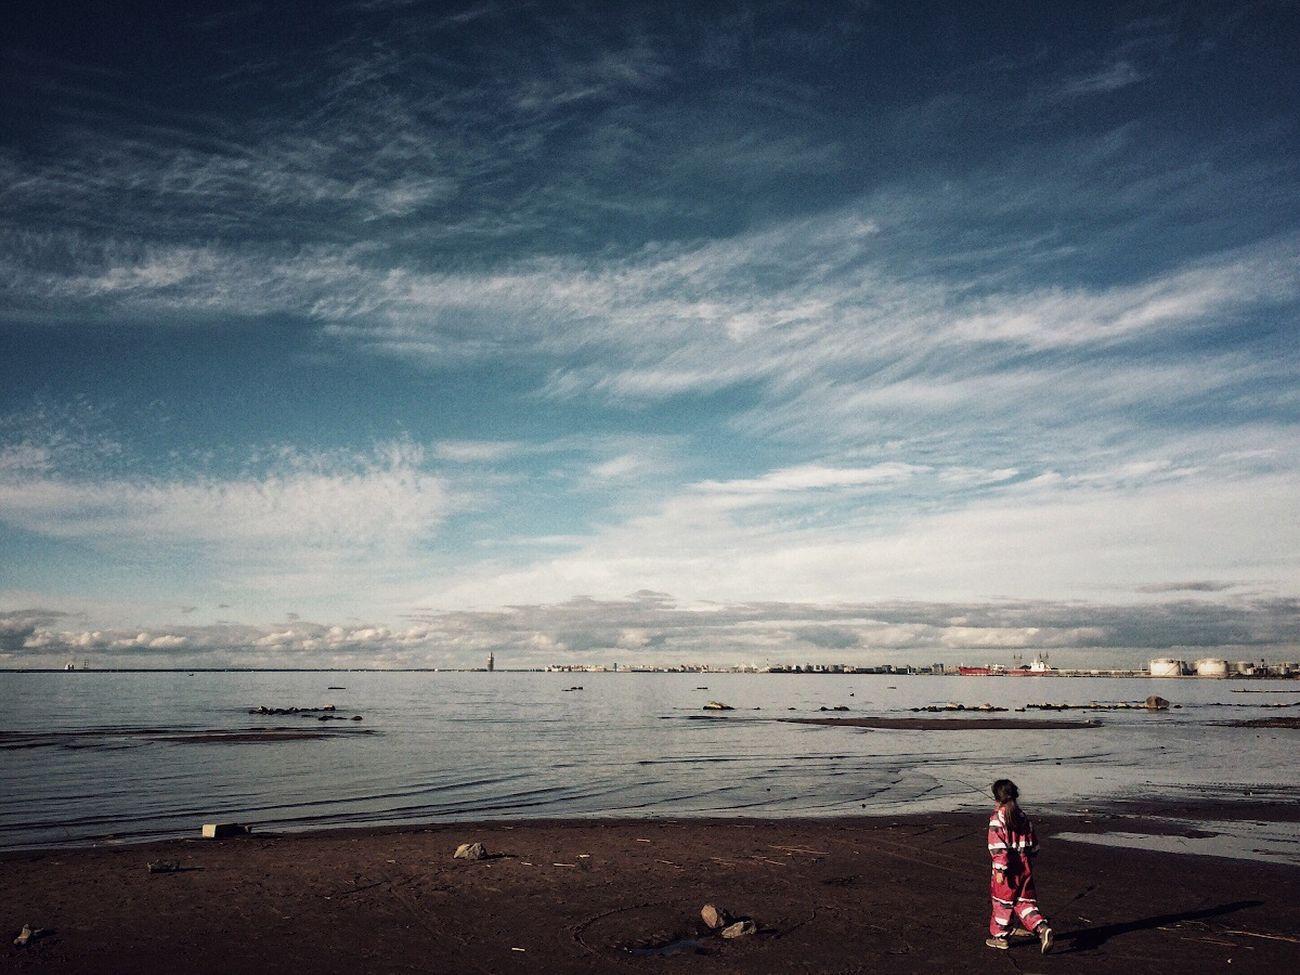 Sky. Spb Sky Landscape st. Peterburg Pietari Gulf Of Finland